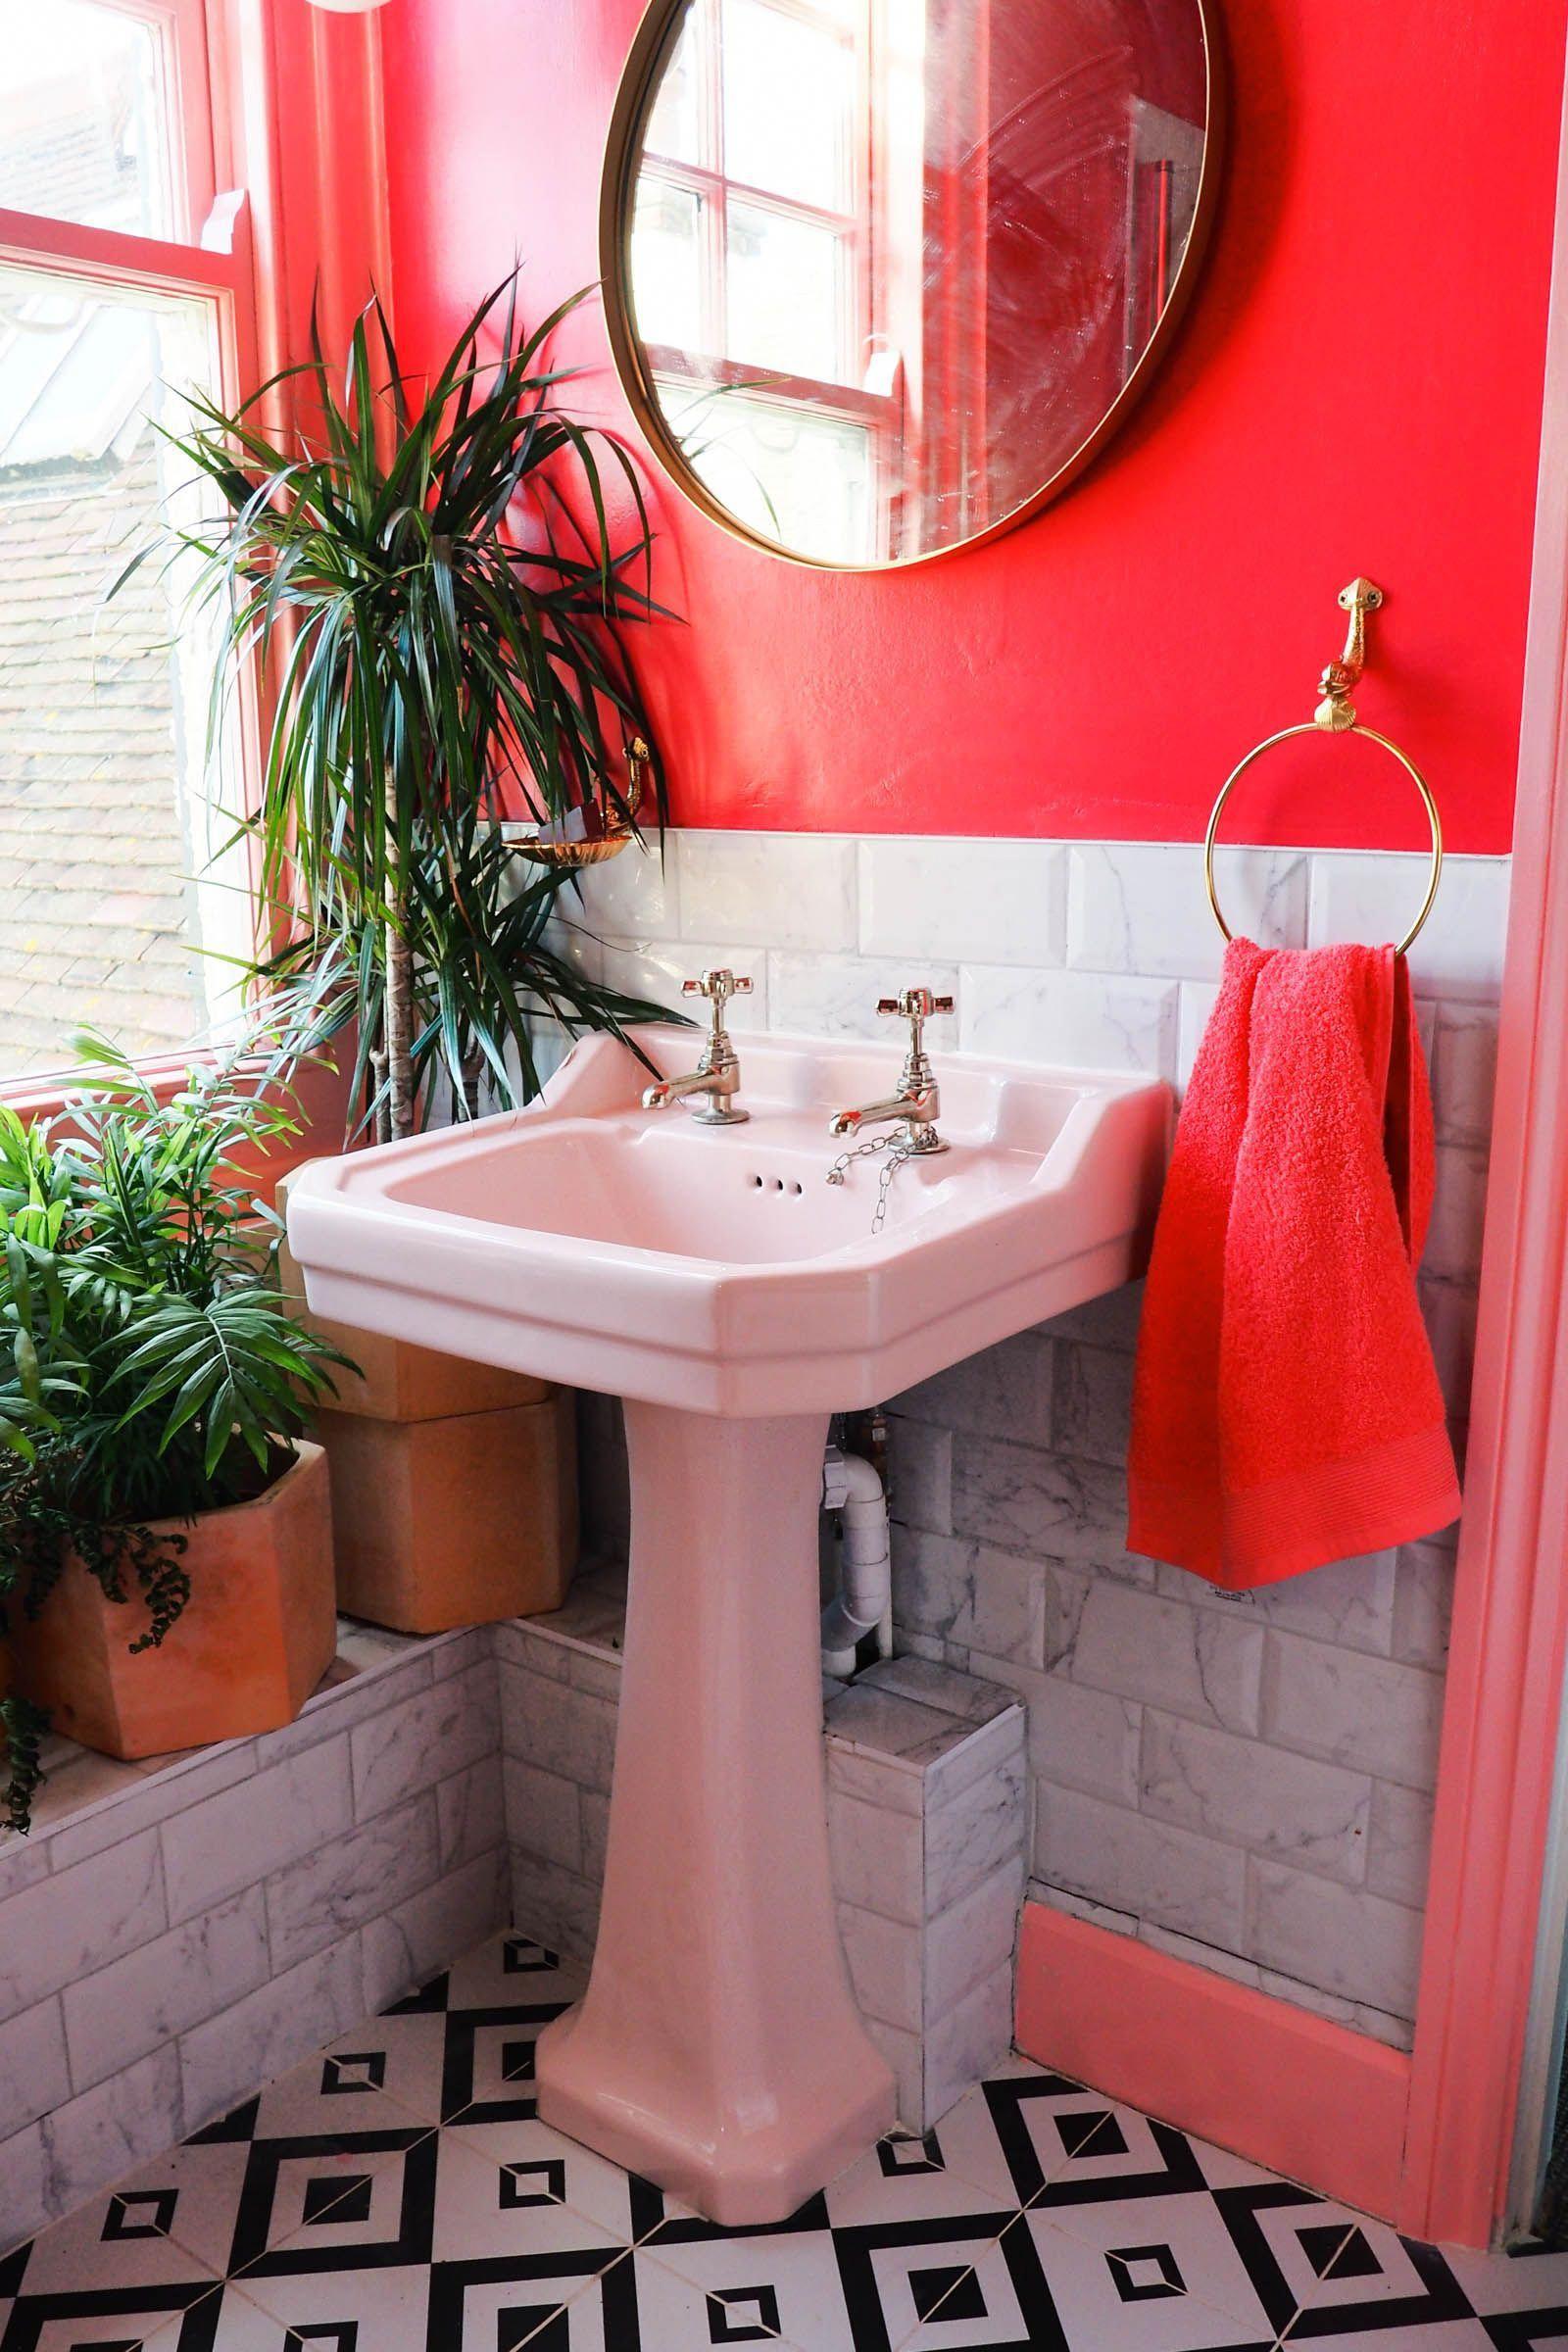 Vintage Pink Bathroom Ideas Bathroom Red Red Bathroom Decor Green Bathroom Accessories